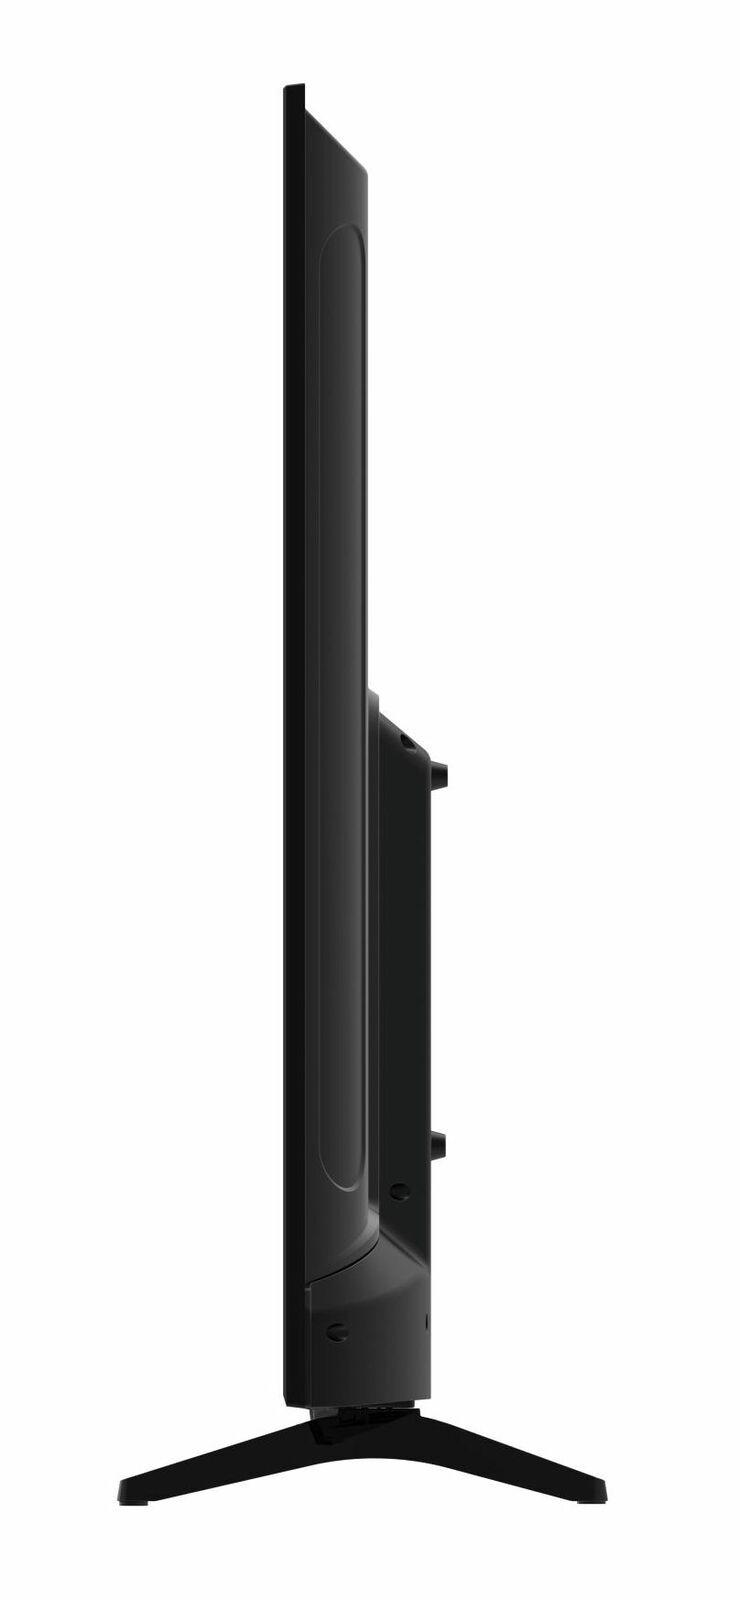 "RCA VIRTUOSO 55"" Class 4K Ultra HD (2160P) Smart LED TV (RNSMU5536) image 8"